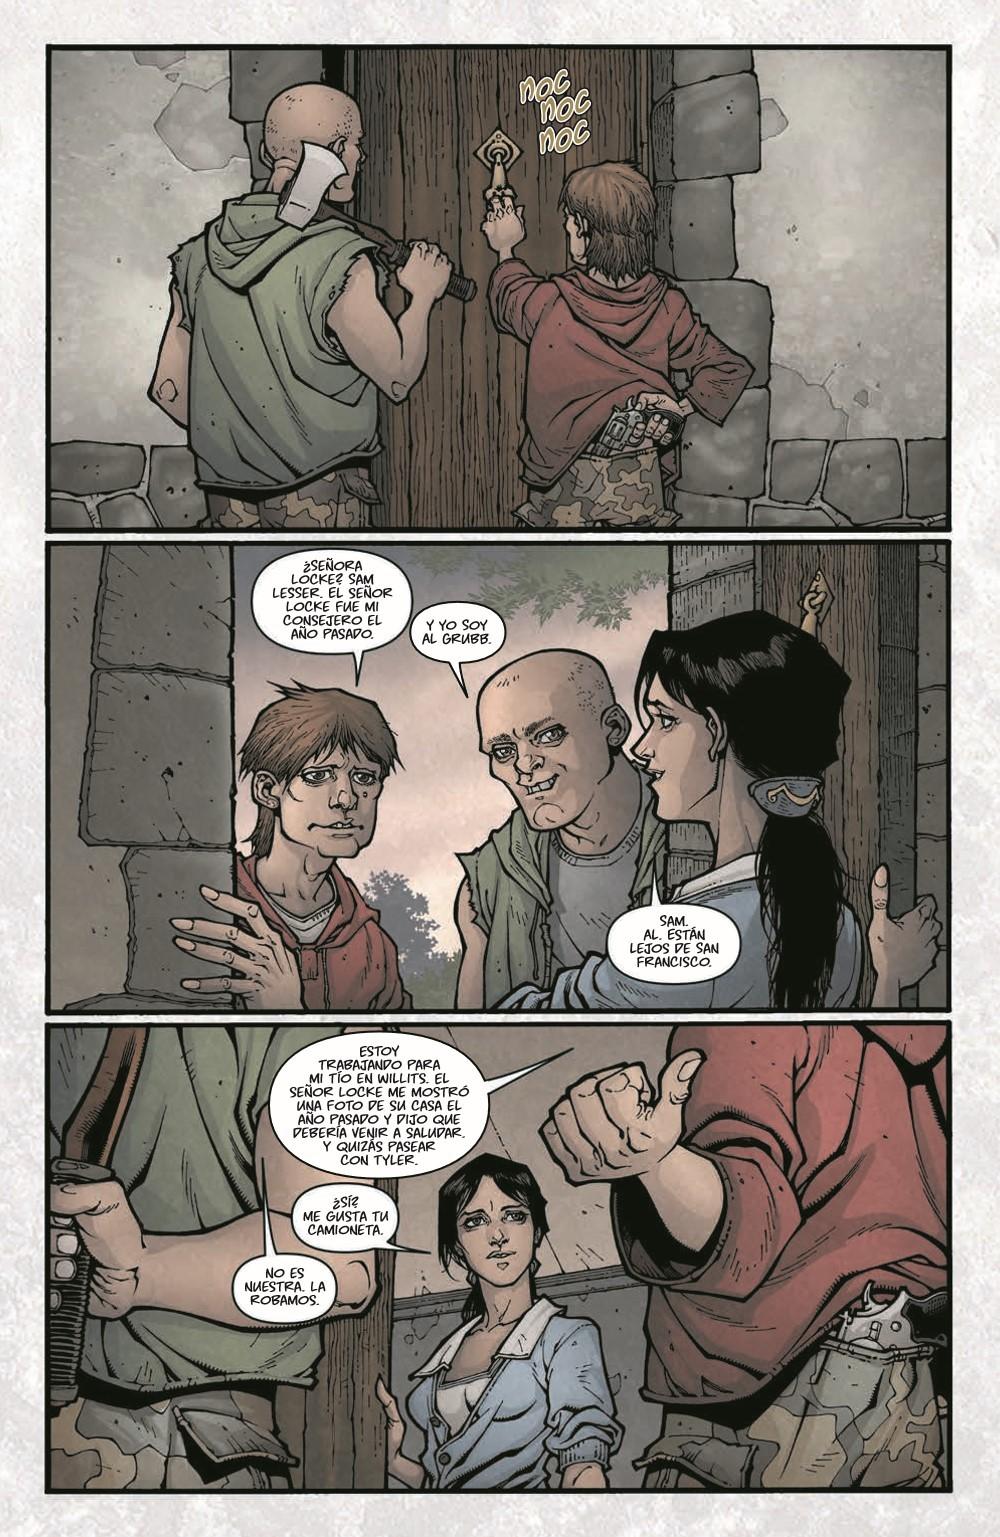 LockeandKey_TPB_pr-5 ComicList Previews: LOCKE AND KEY VOLUME 1 BIENVENIDOS A LOVECRAFT TP